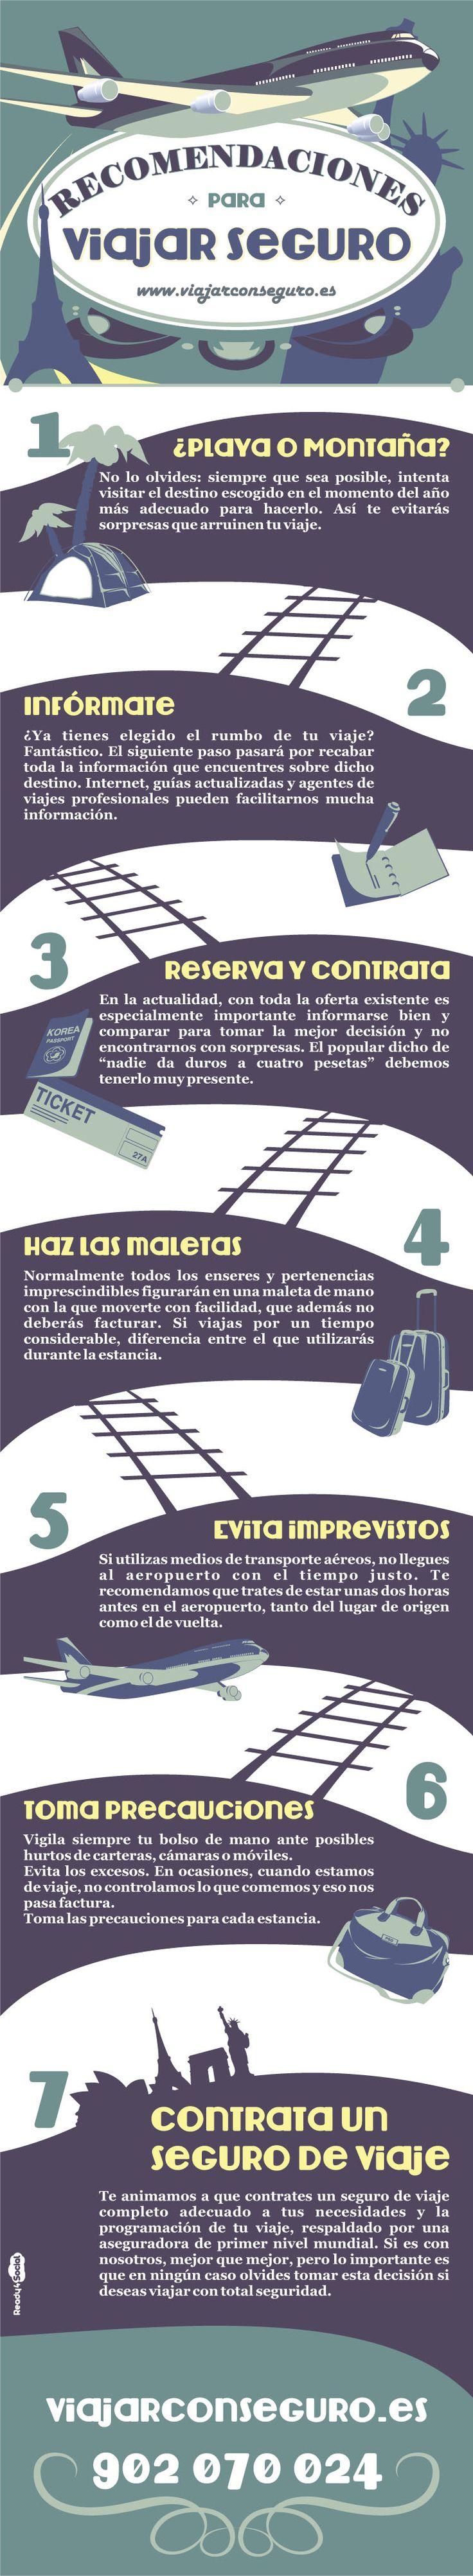 infografiaviajarseguro